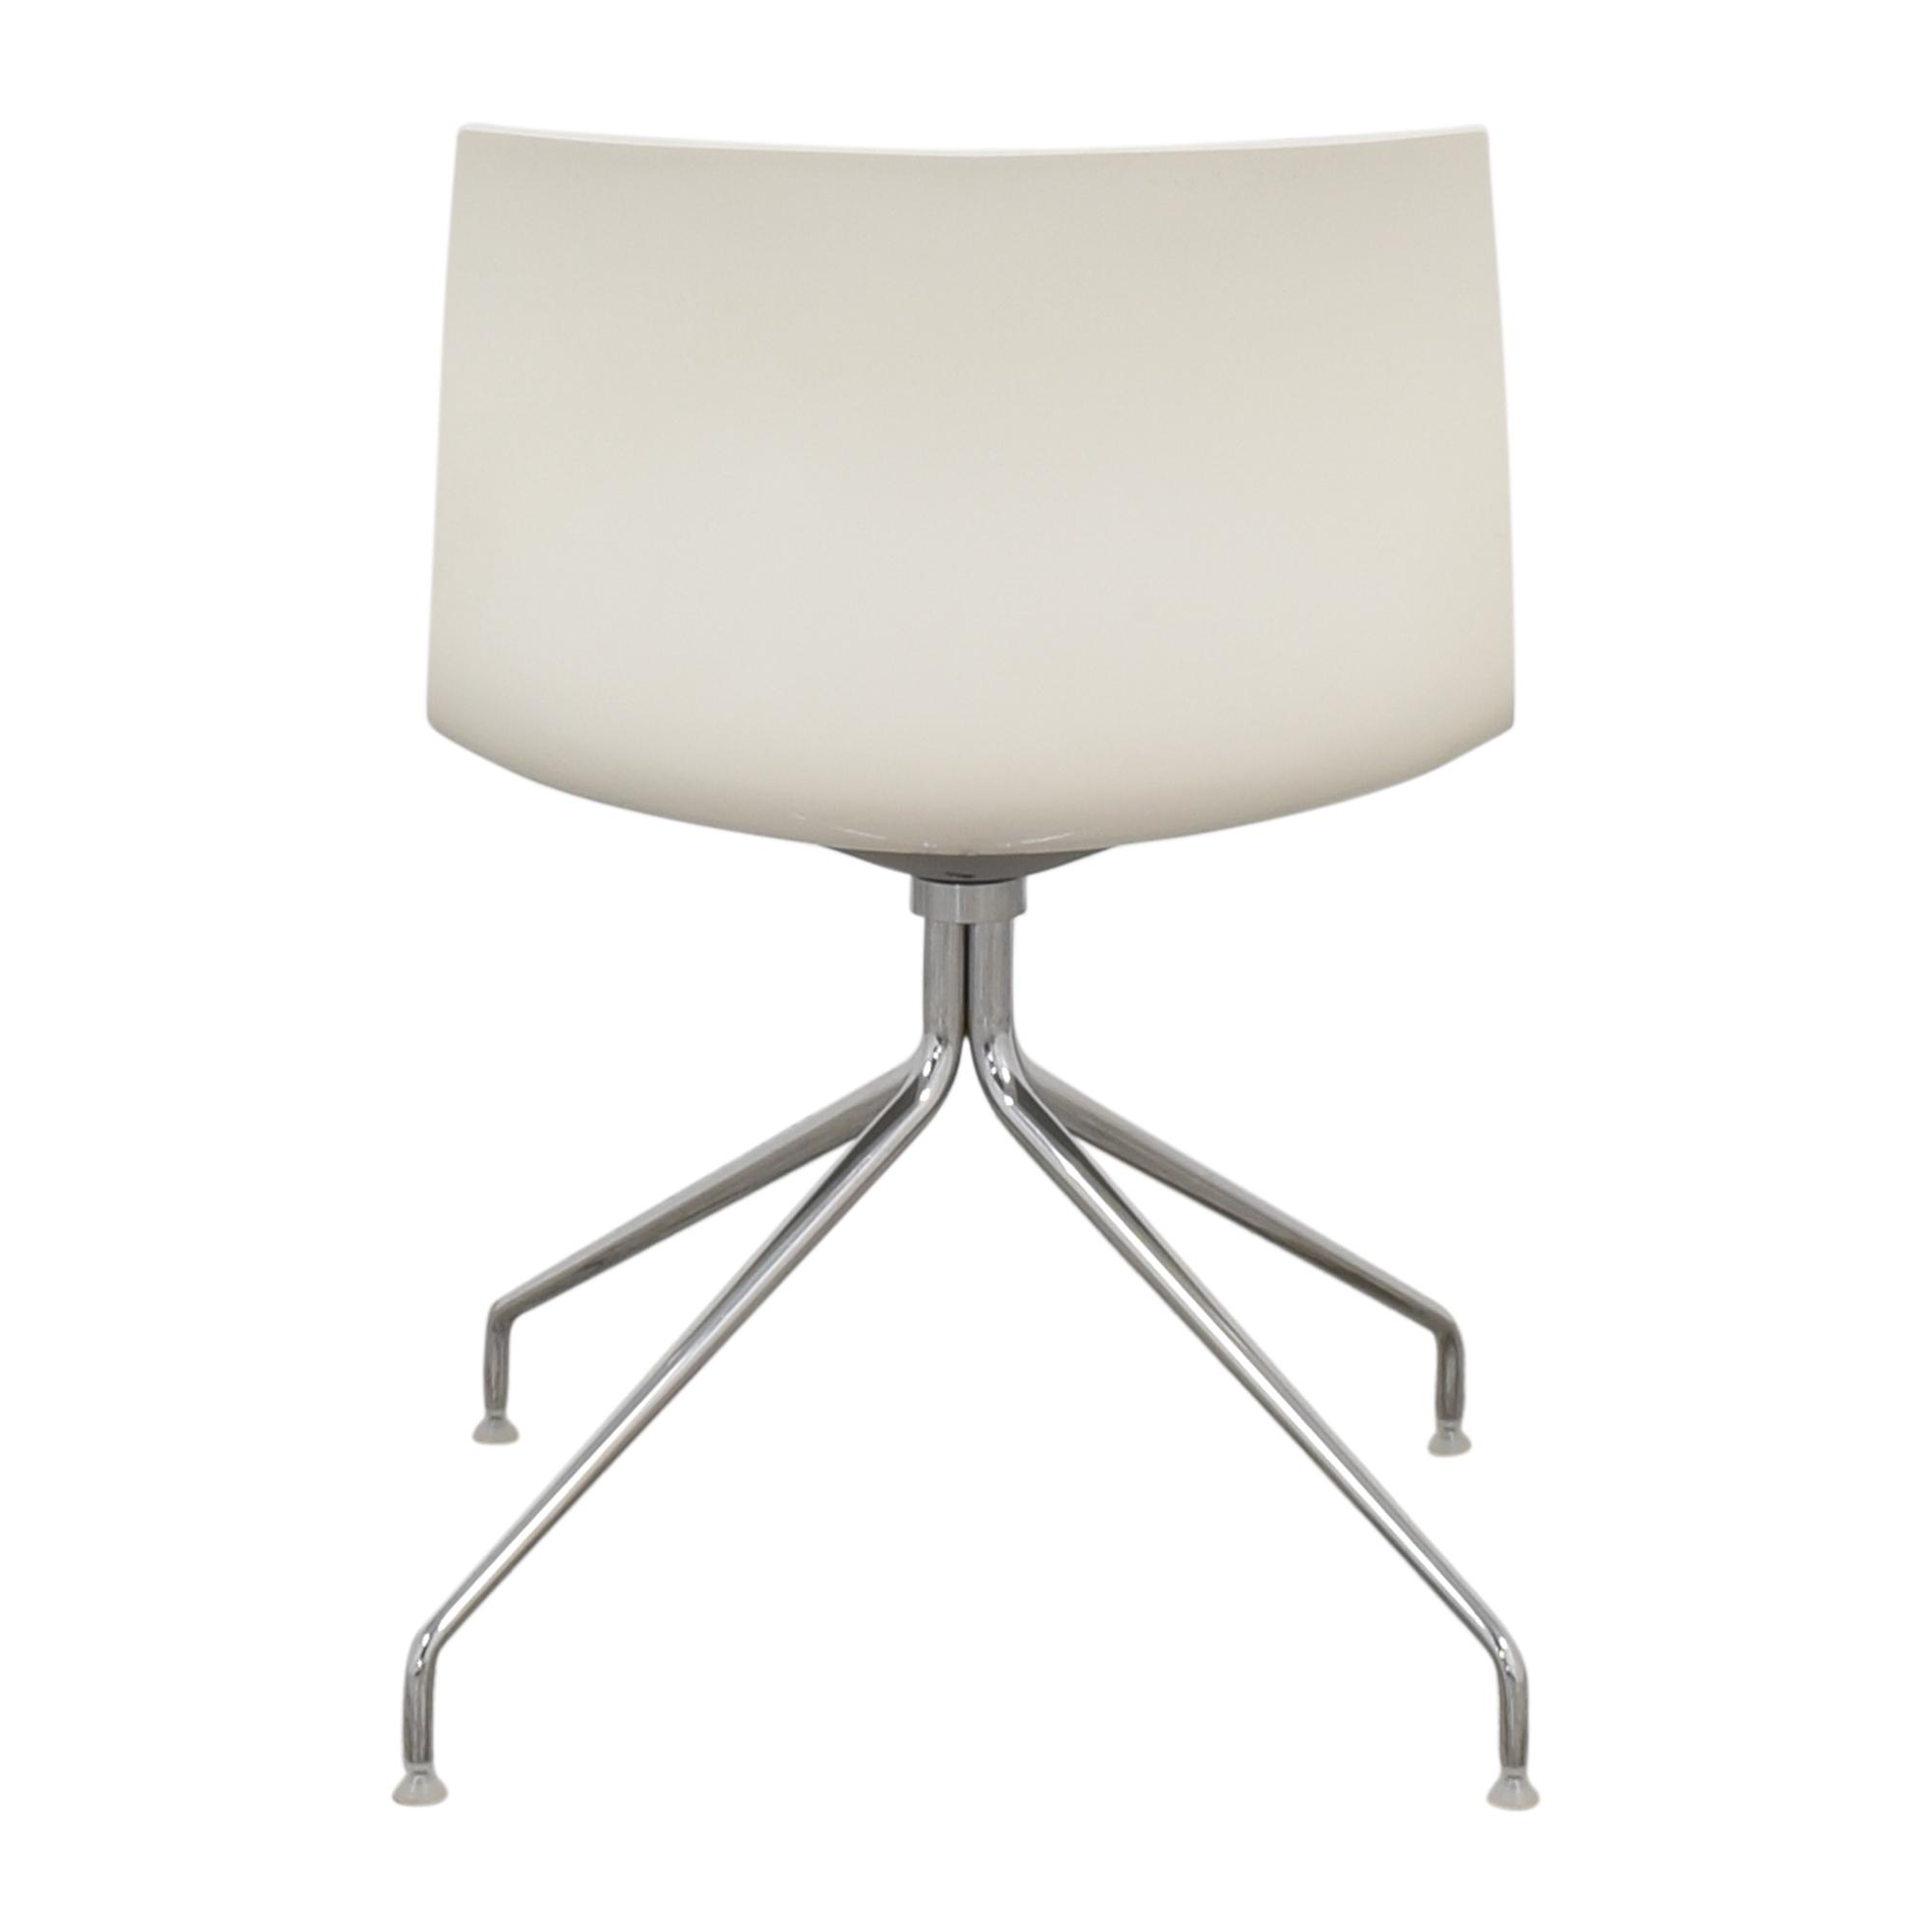 Arper Catifa 46 Trestle Swivel Chair / Chairs